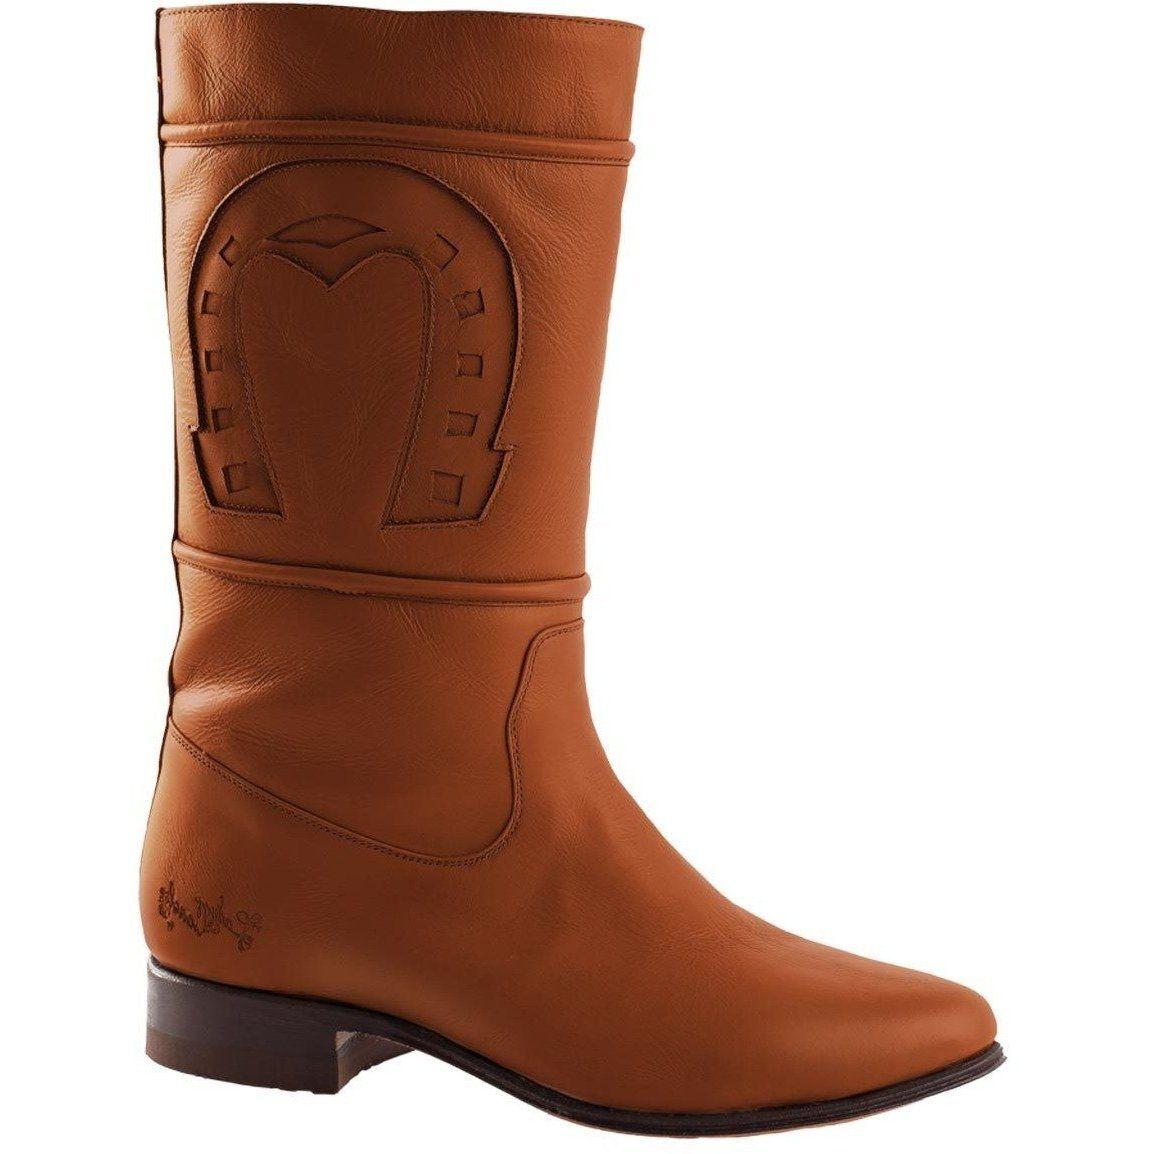 8f2c7ed519 Mexican charro saddle boots western bota jalisco escaramuza